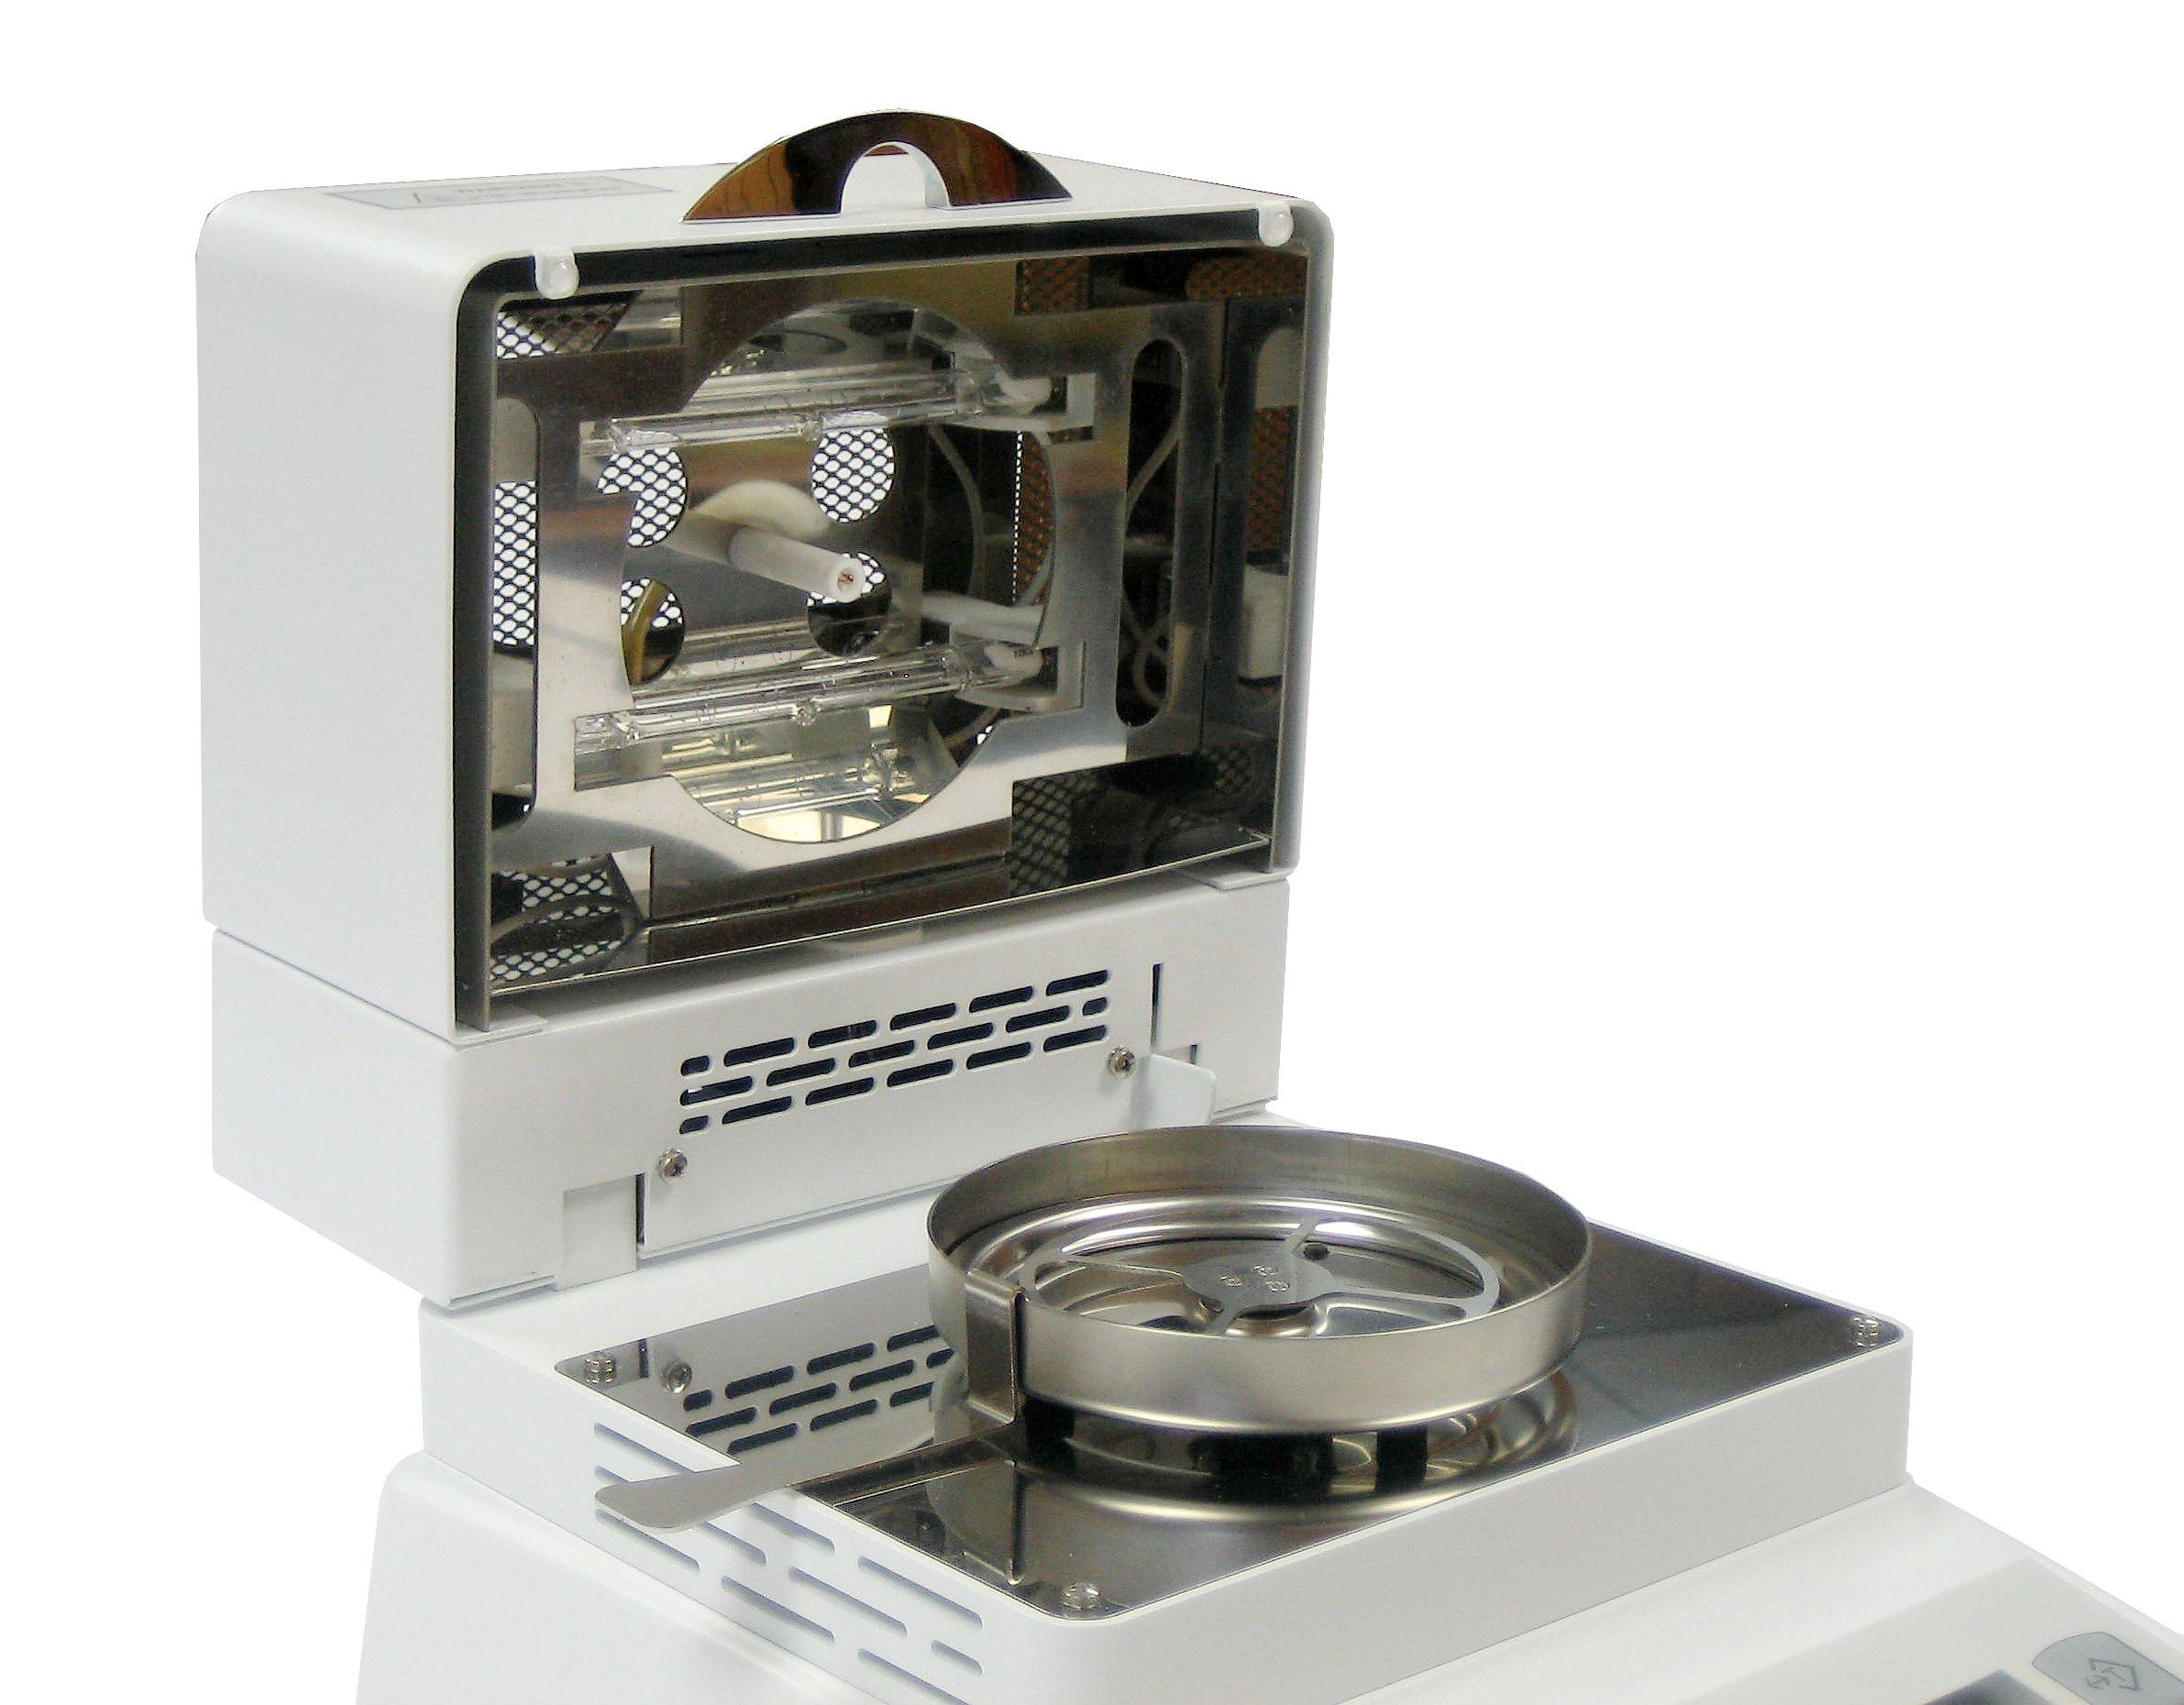 Torbal AGS60 Moisture Analyzer 250C - 0.01% Readability, 250W, 60g x 0.001g, Backlit Graphical LCD Display, USB, Heavy Duty Die-cast Metal Design